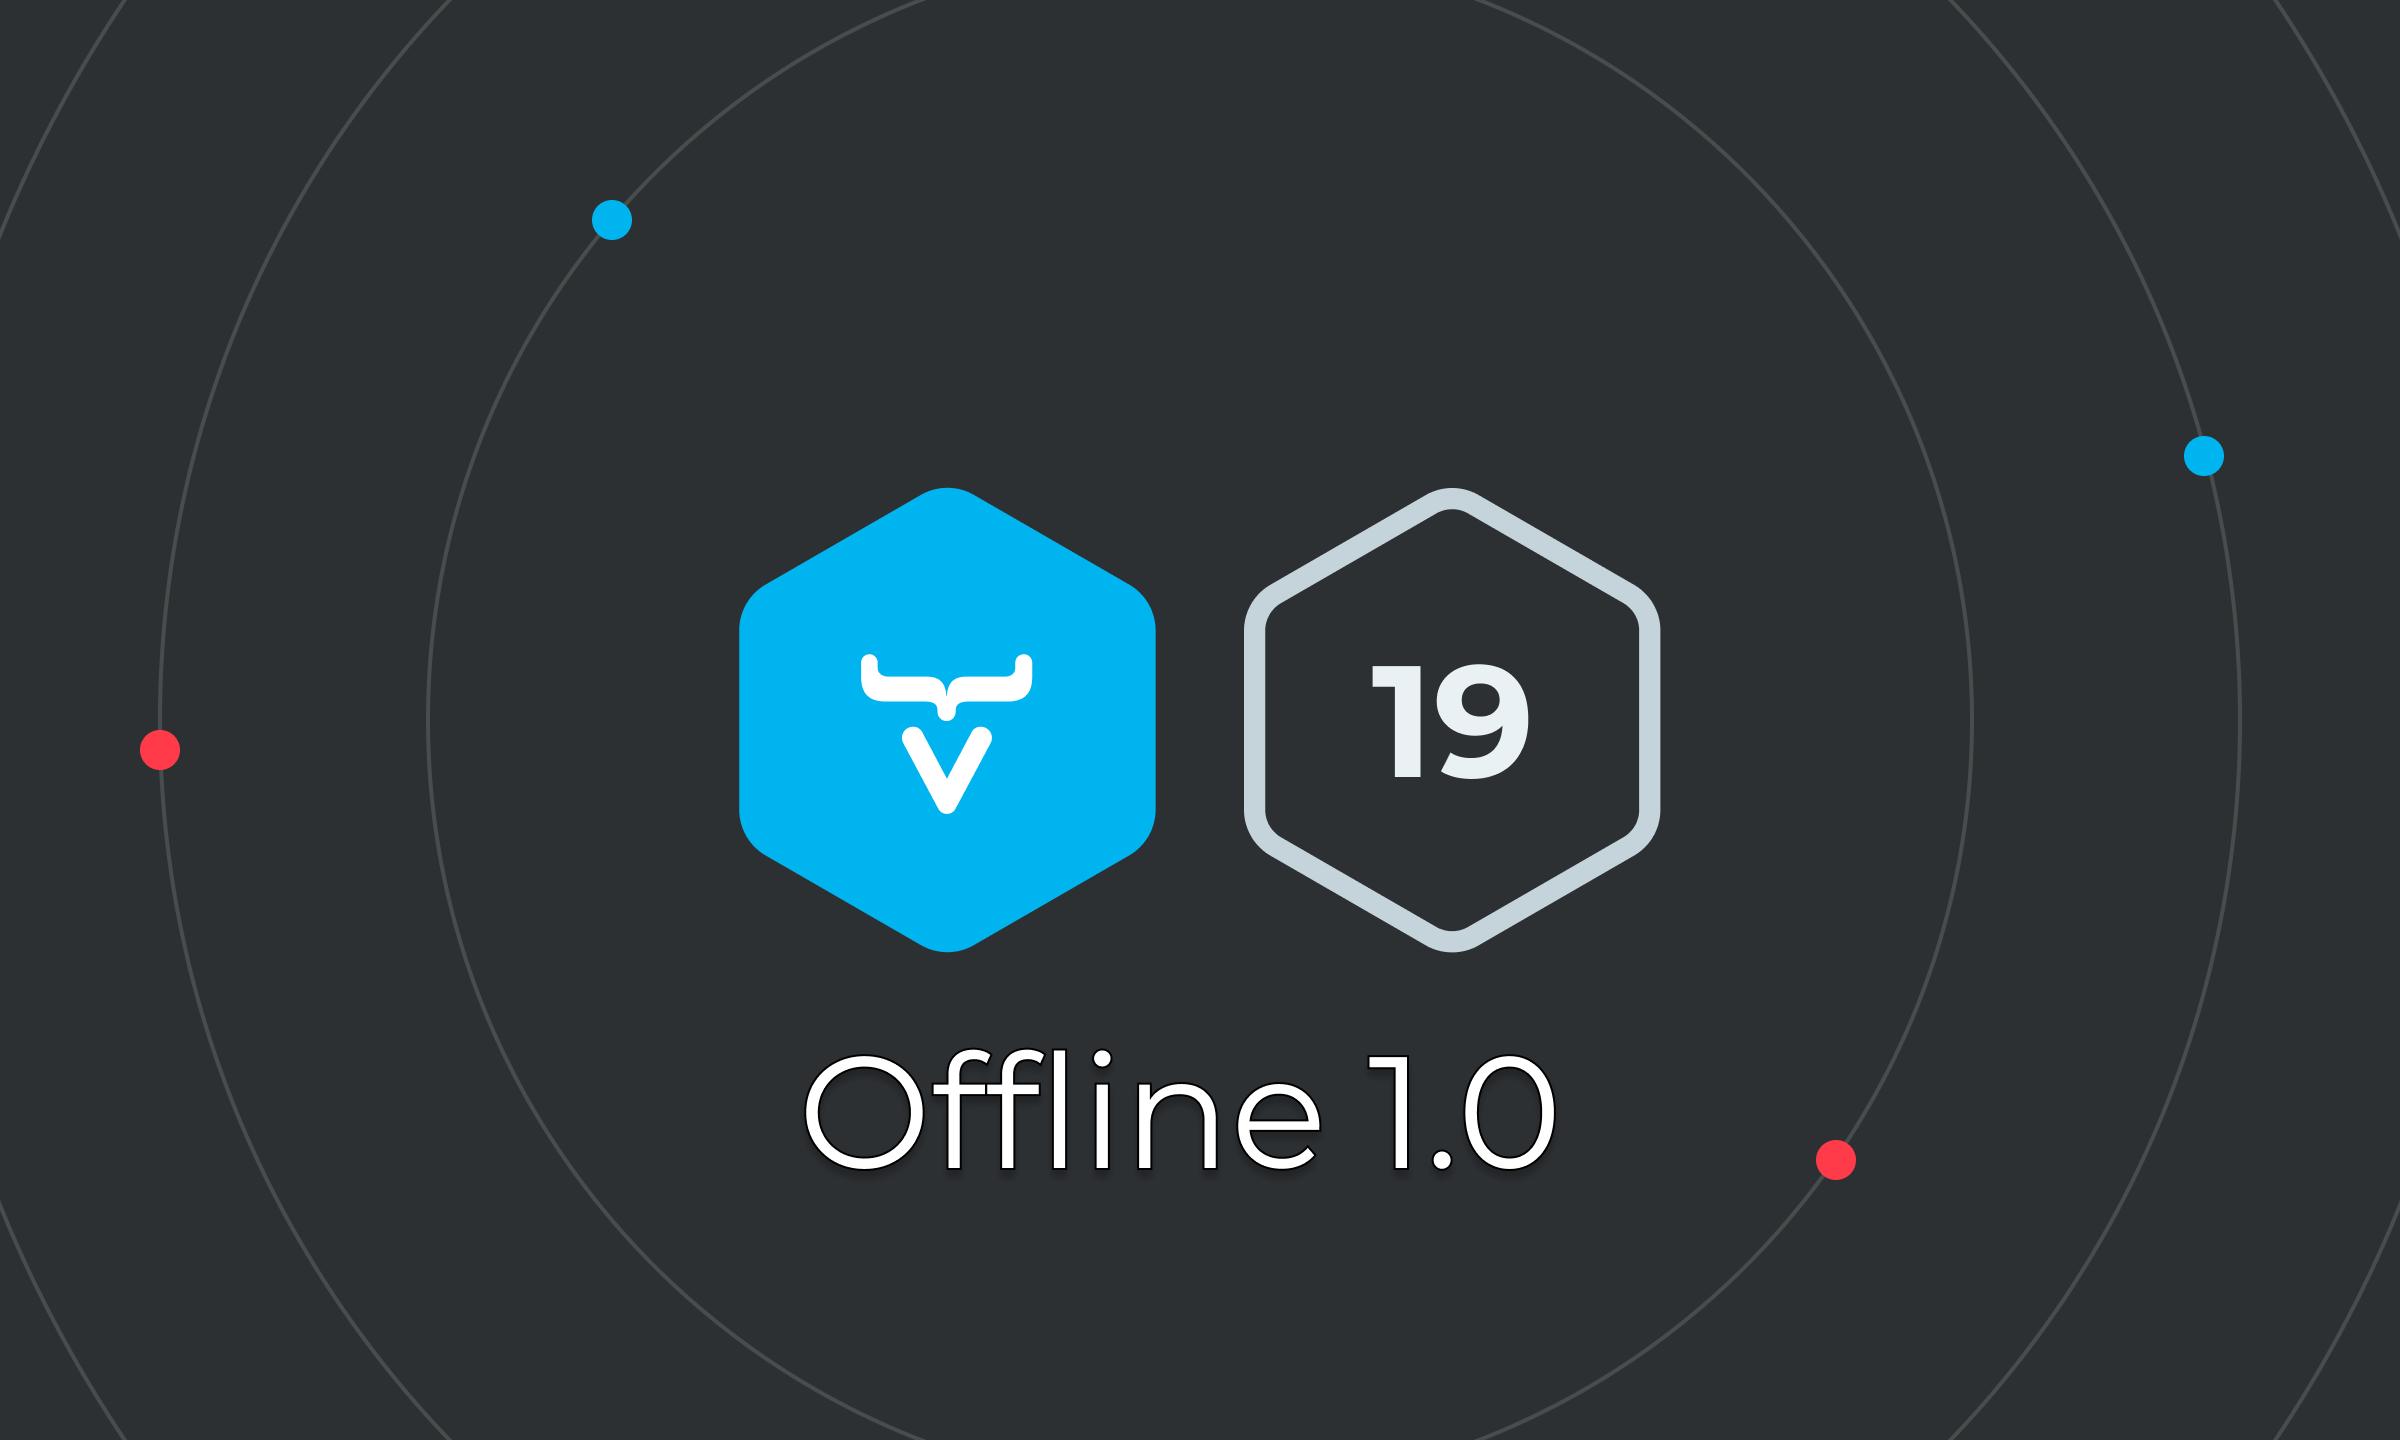 Vaadin Fusion 19 - offline support